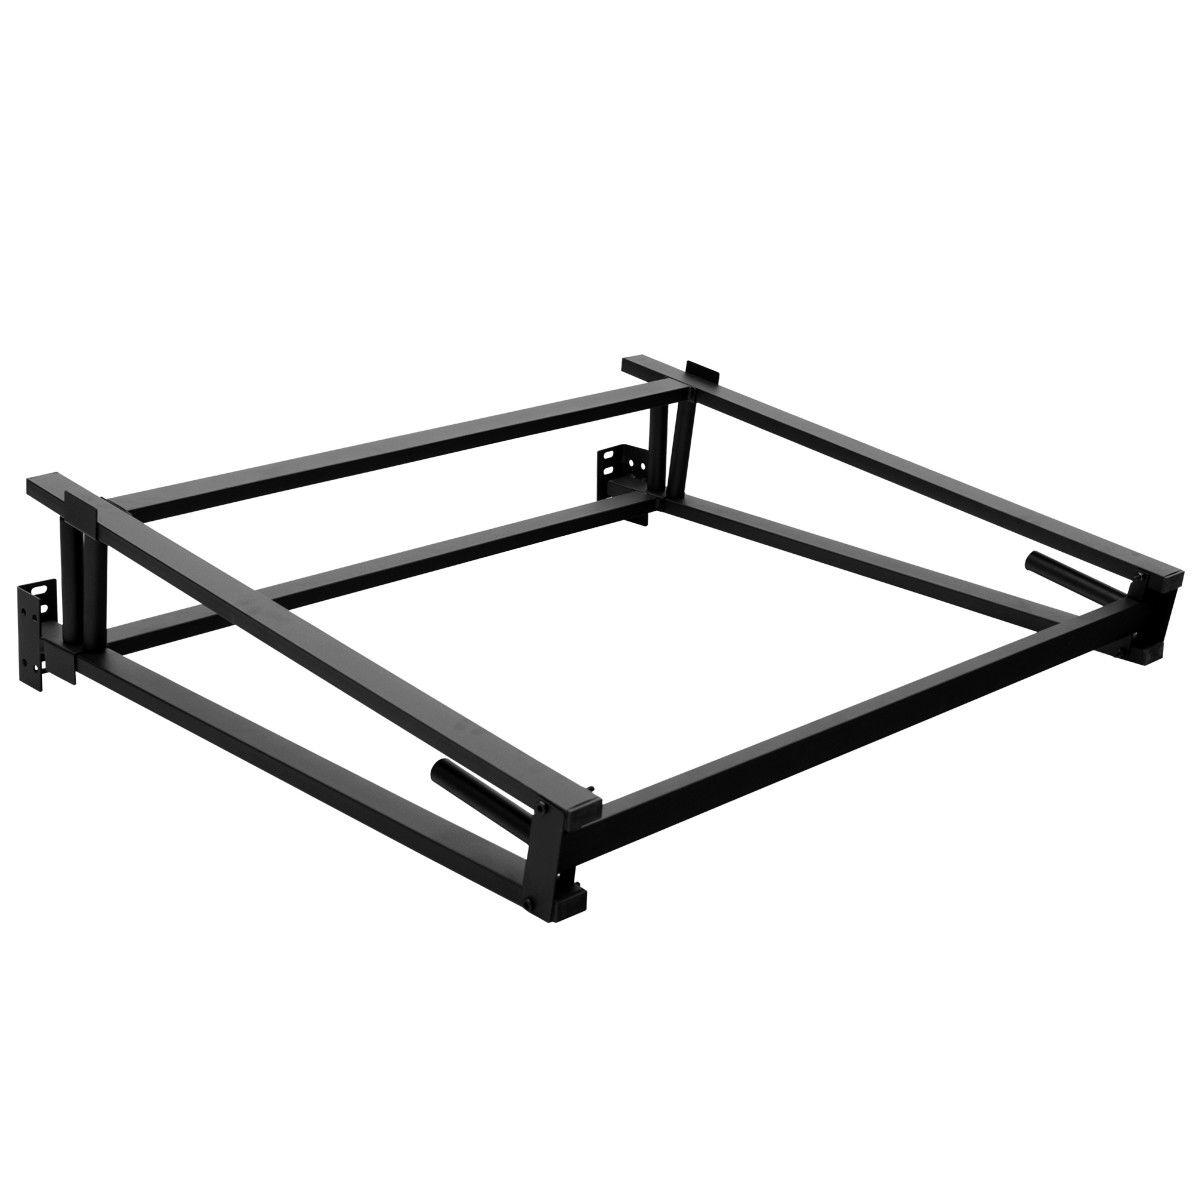 Black Duty Metal Support Bedroom Size